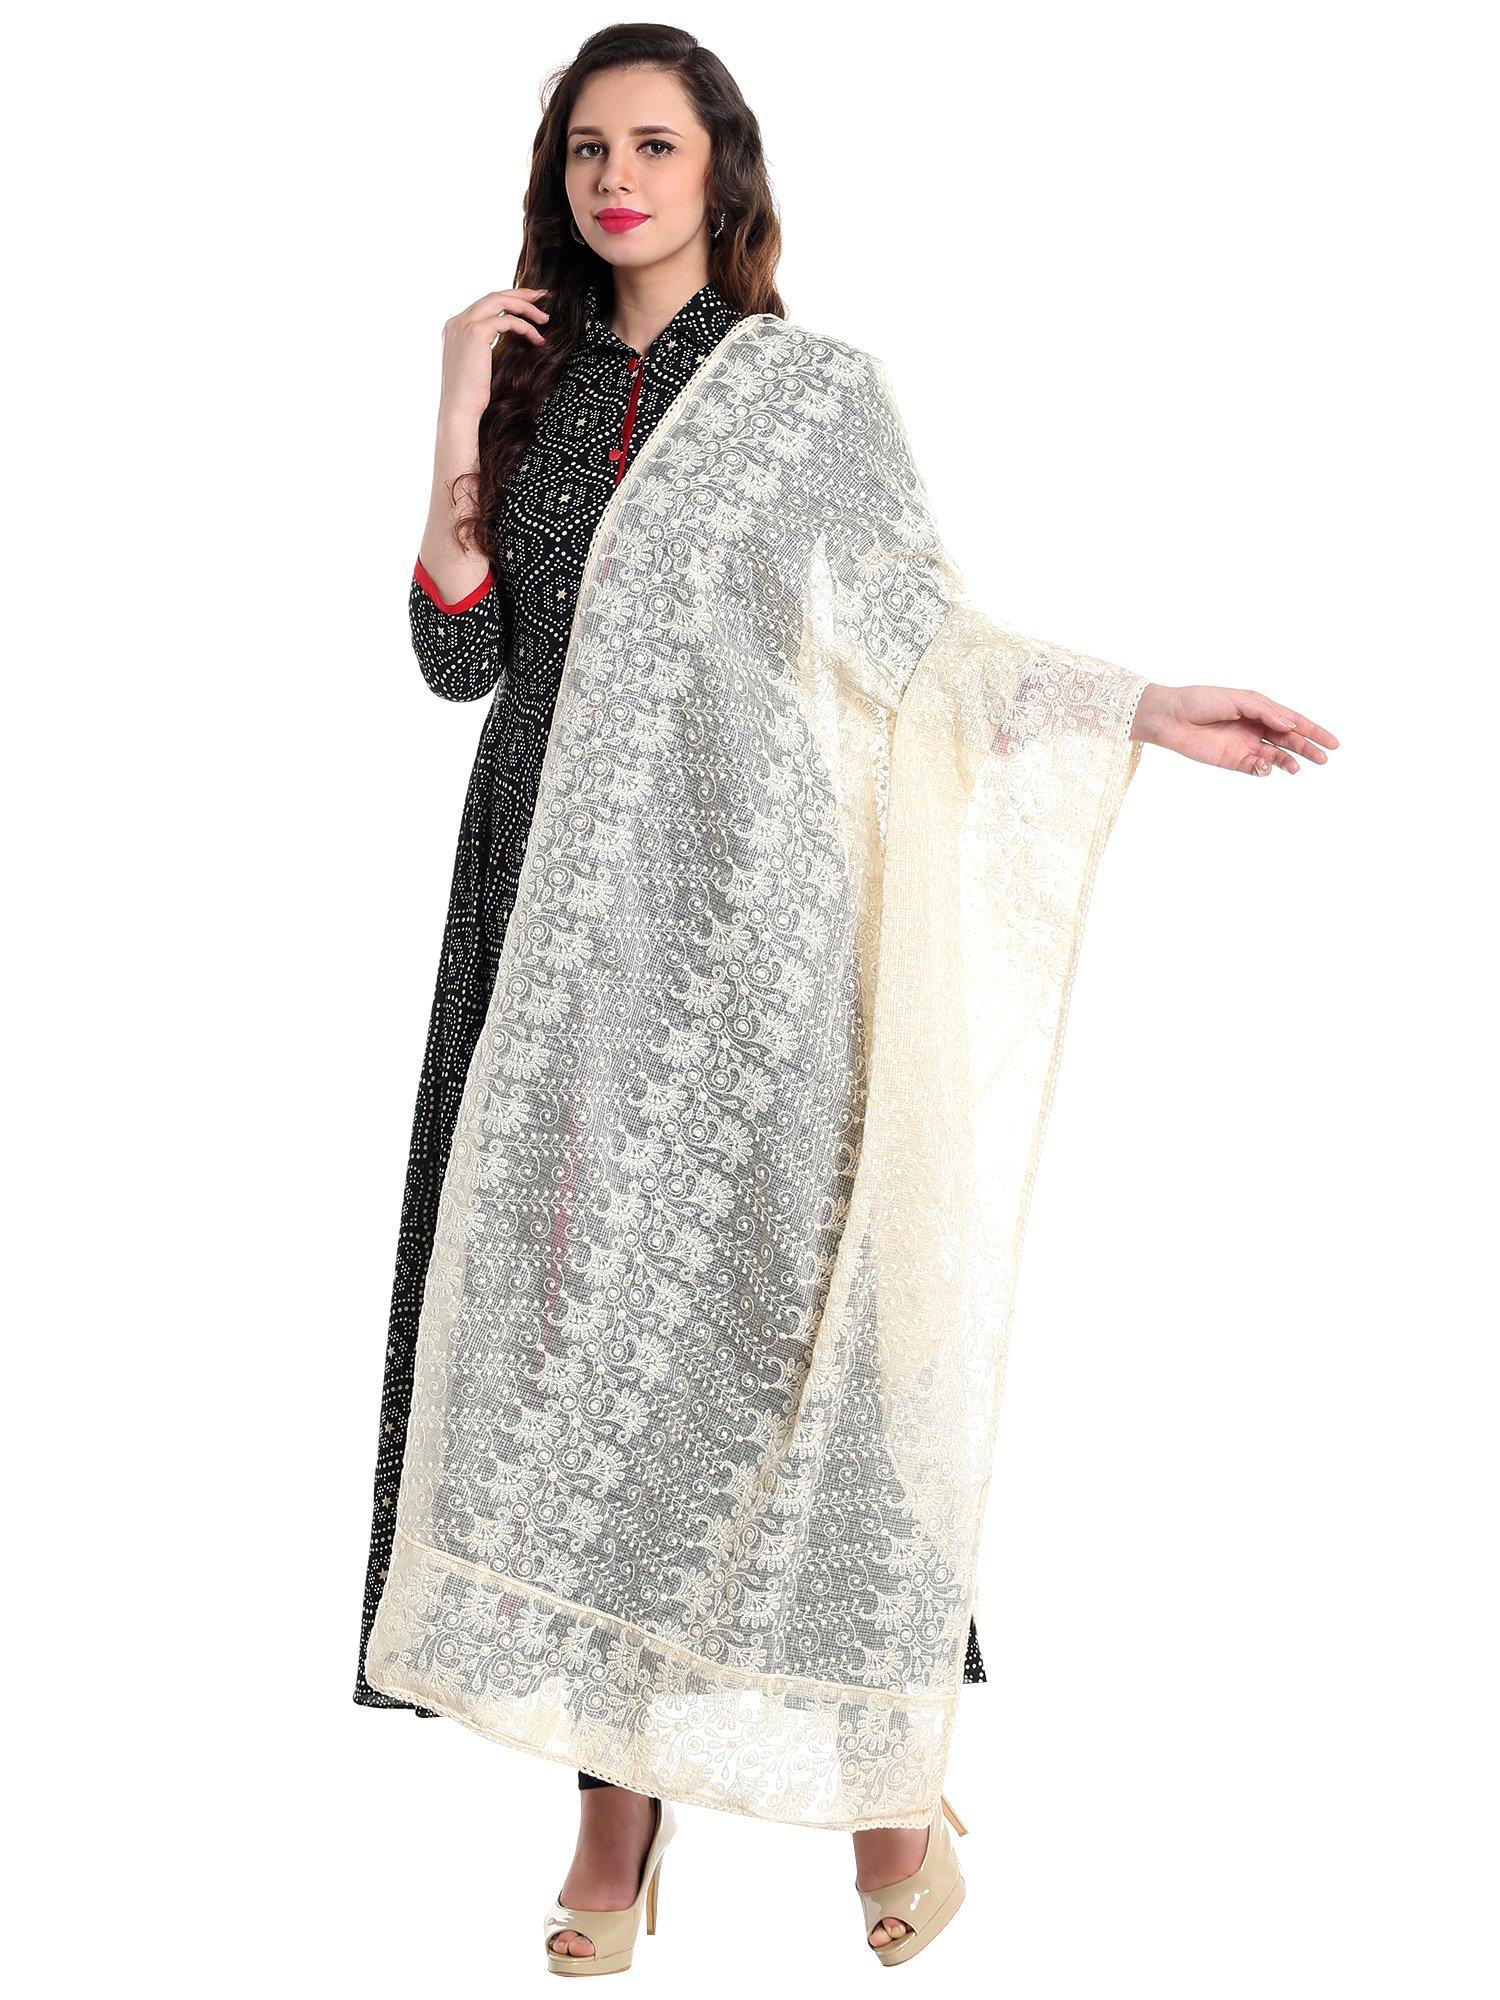 Dupatta Bazaar Women's Ivory Cotton Lucknowi Embroidery dupatta